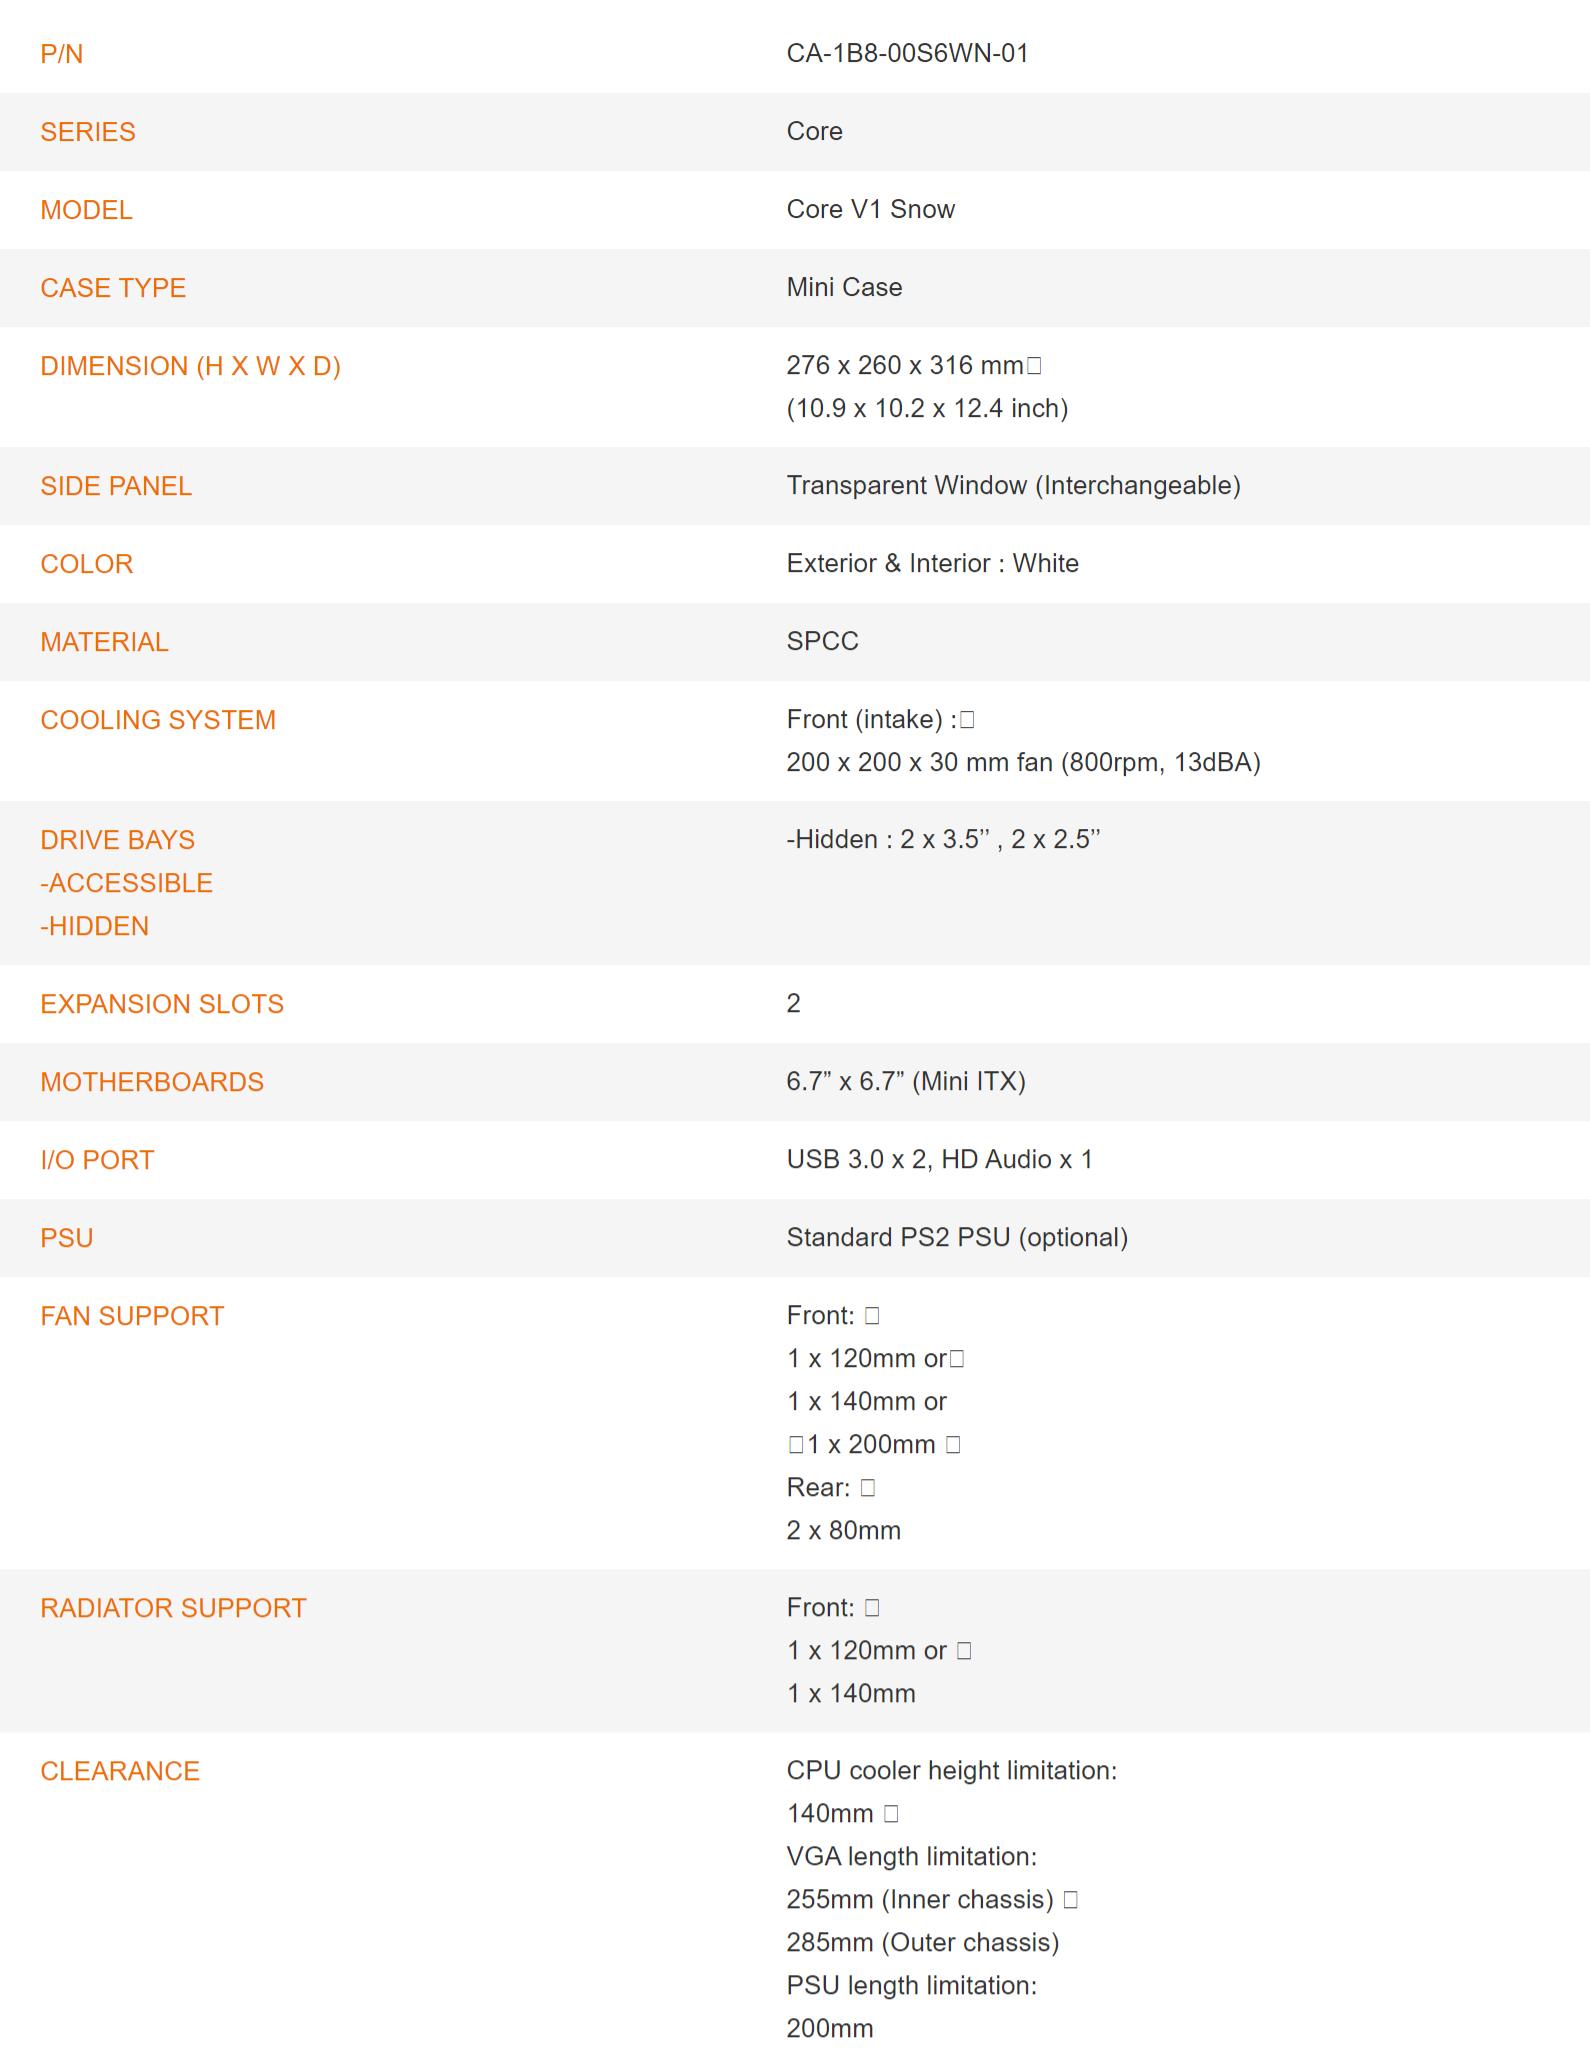 screencapture-uk-thermaltake-core-v1-snow-edition-html-2021-01-22-14_40_20.png